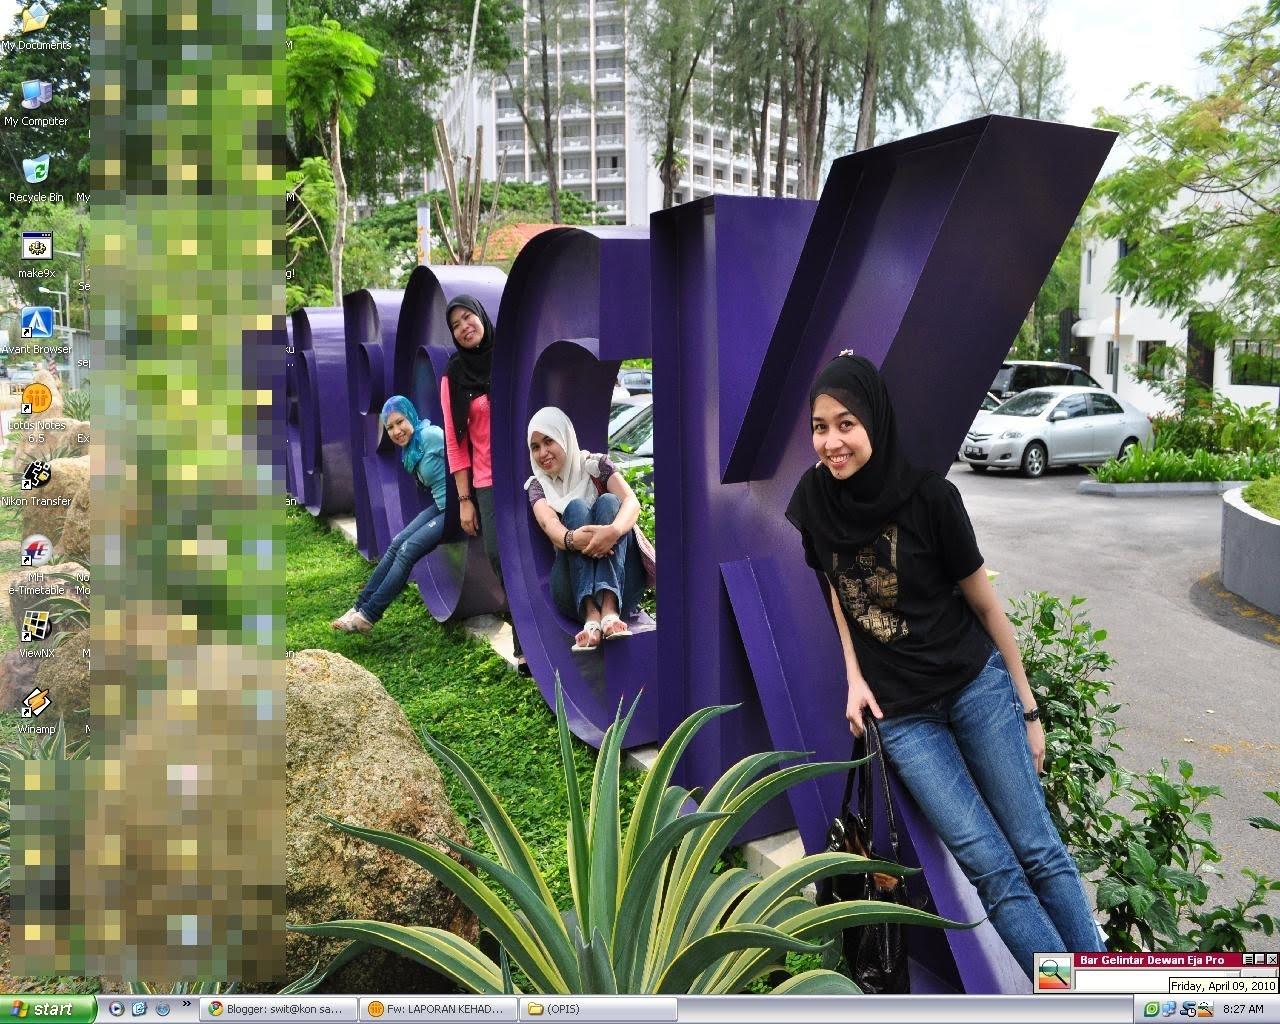 http://2.bp.blogspot.com/_FpR8pJF7lmY/S752b_zGbsI/AAAAAAAADS8/UA-QH0BDlZU/s1600/wallpaper.JPG